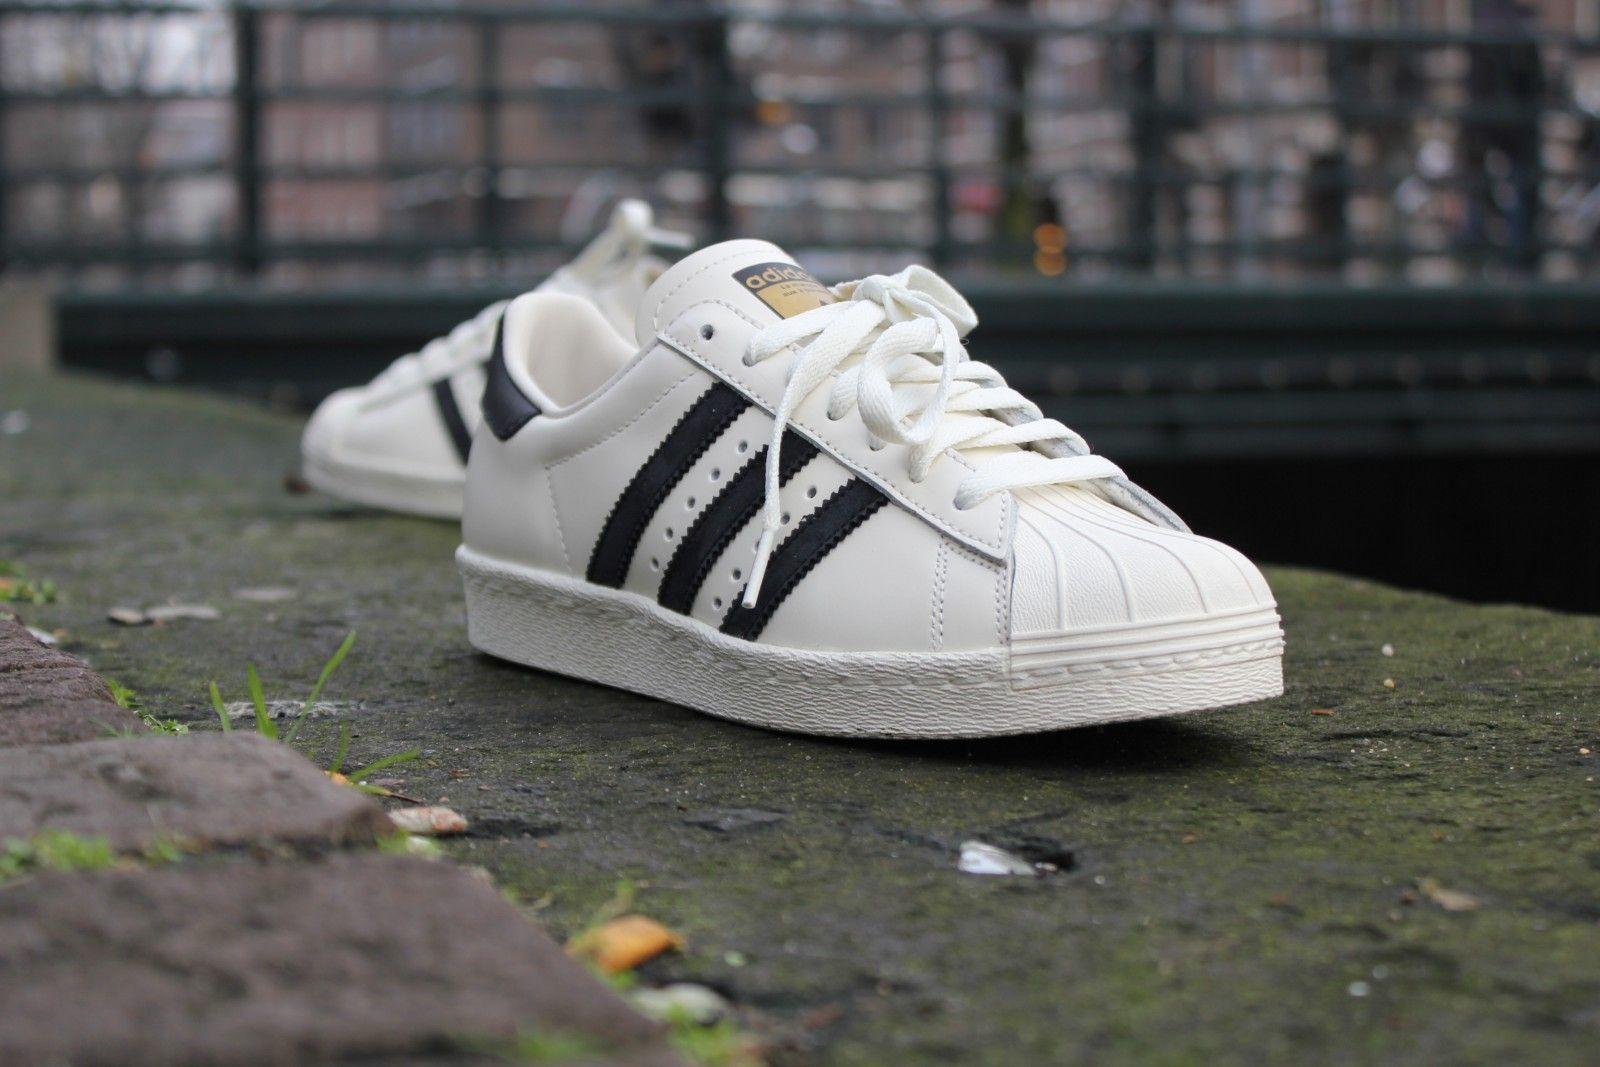 Adidas Superstar 80s Vintage Deluxe Black - B25963